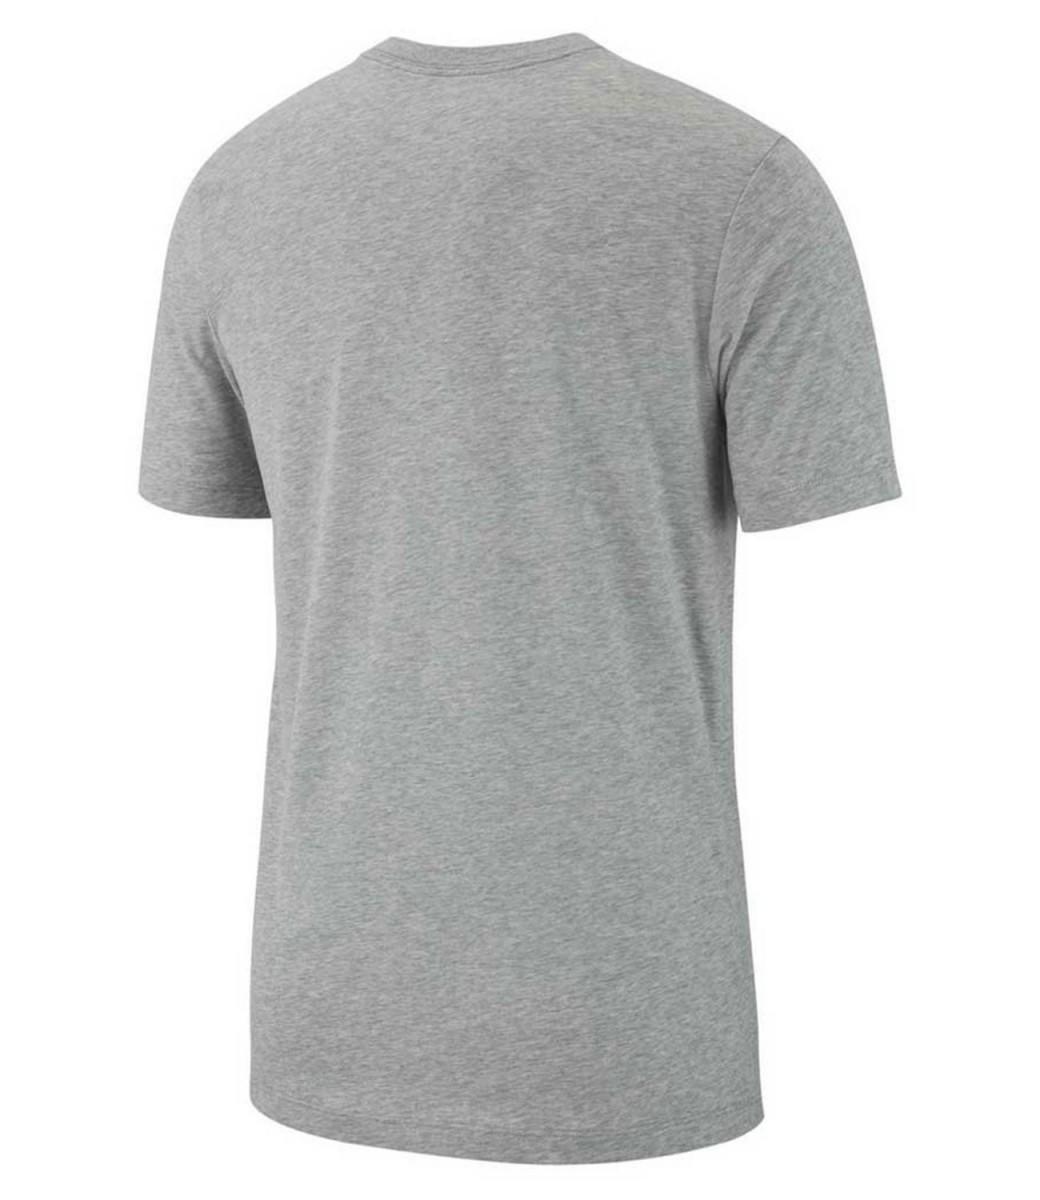 Теннисная футболка мужская Nike Dry Tee Dfc Crew Solid dark grey heather/black